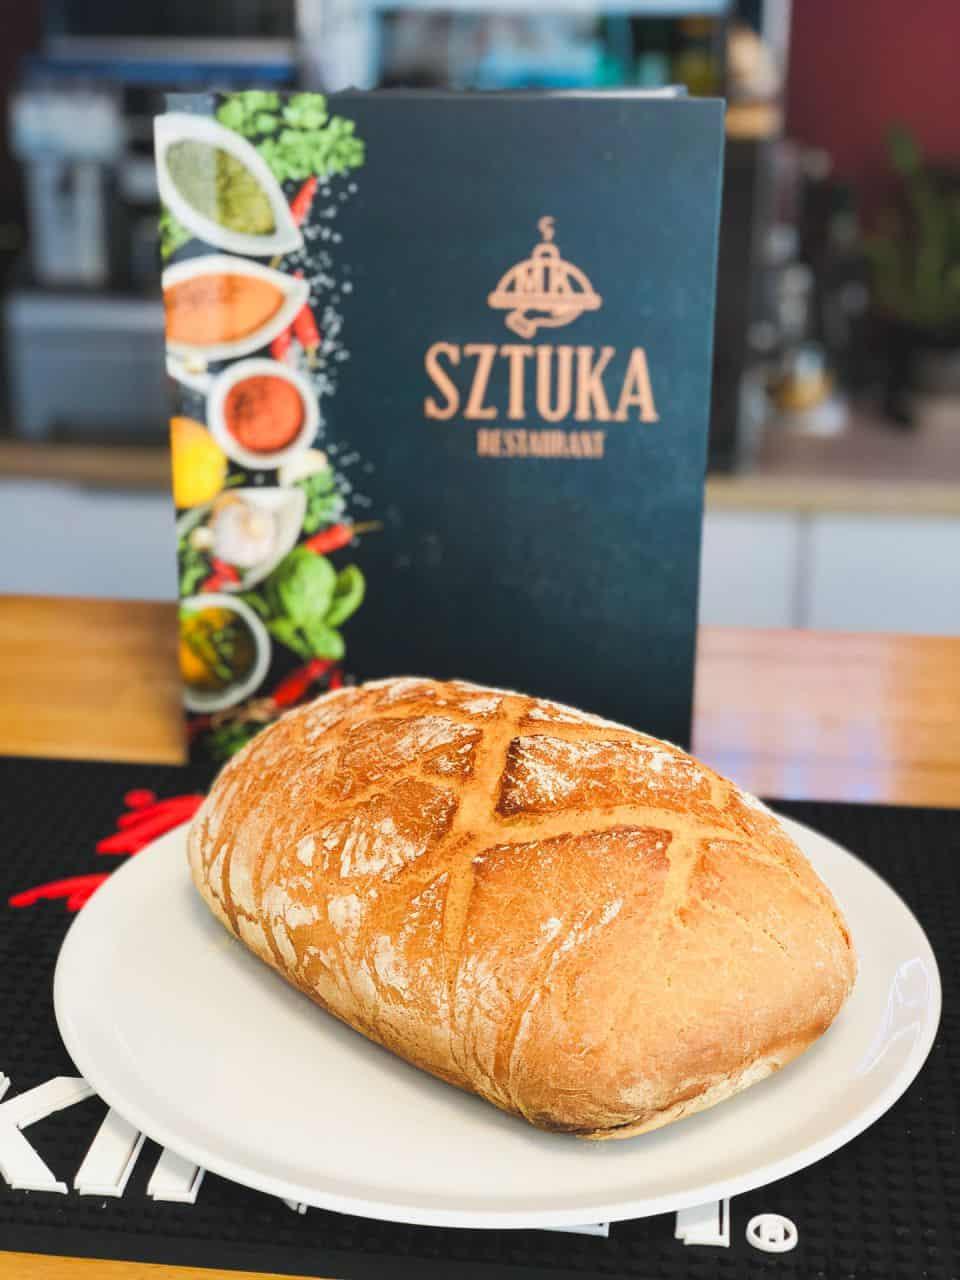 chleb na tle okładki menu restauracji Sztuka